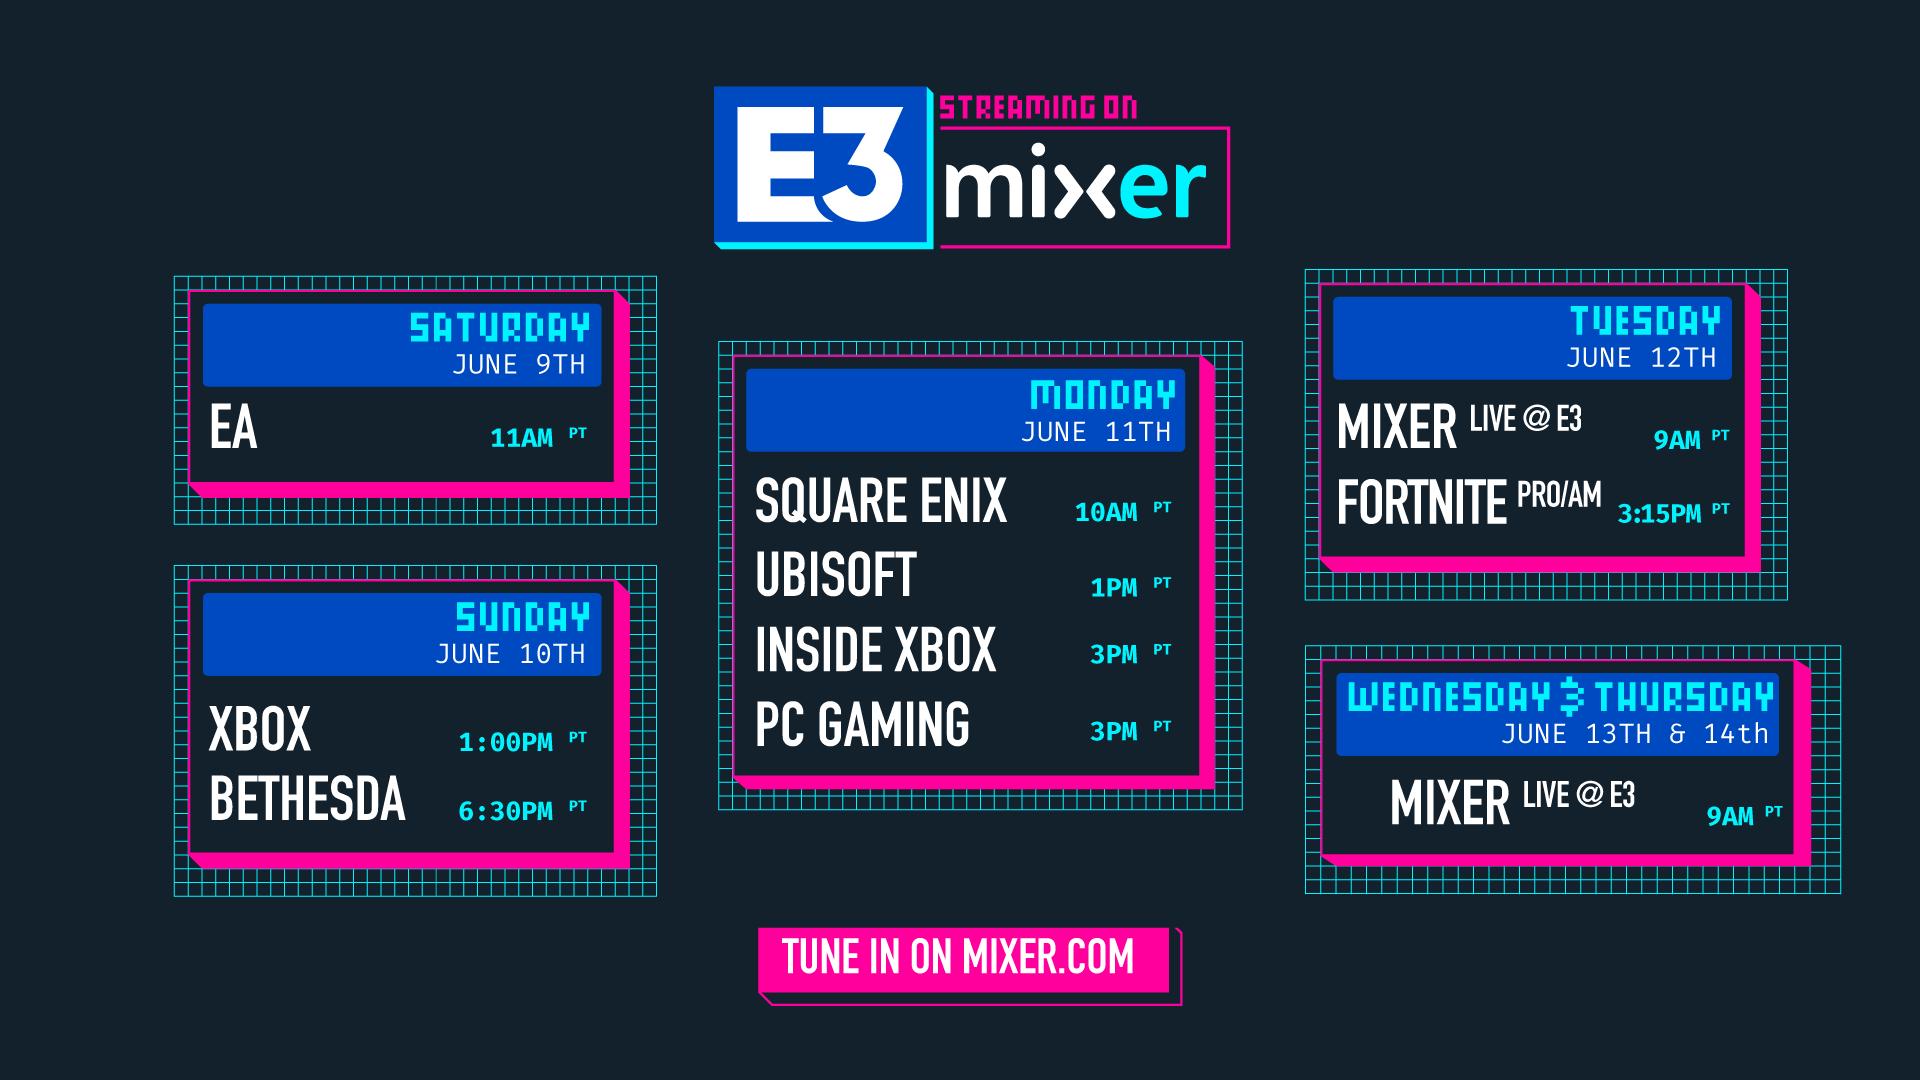 MixPot-mixer-e3-schedule